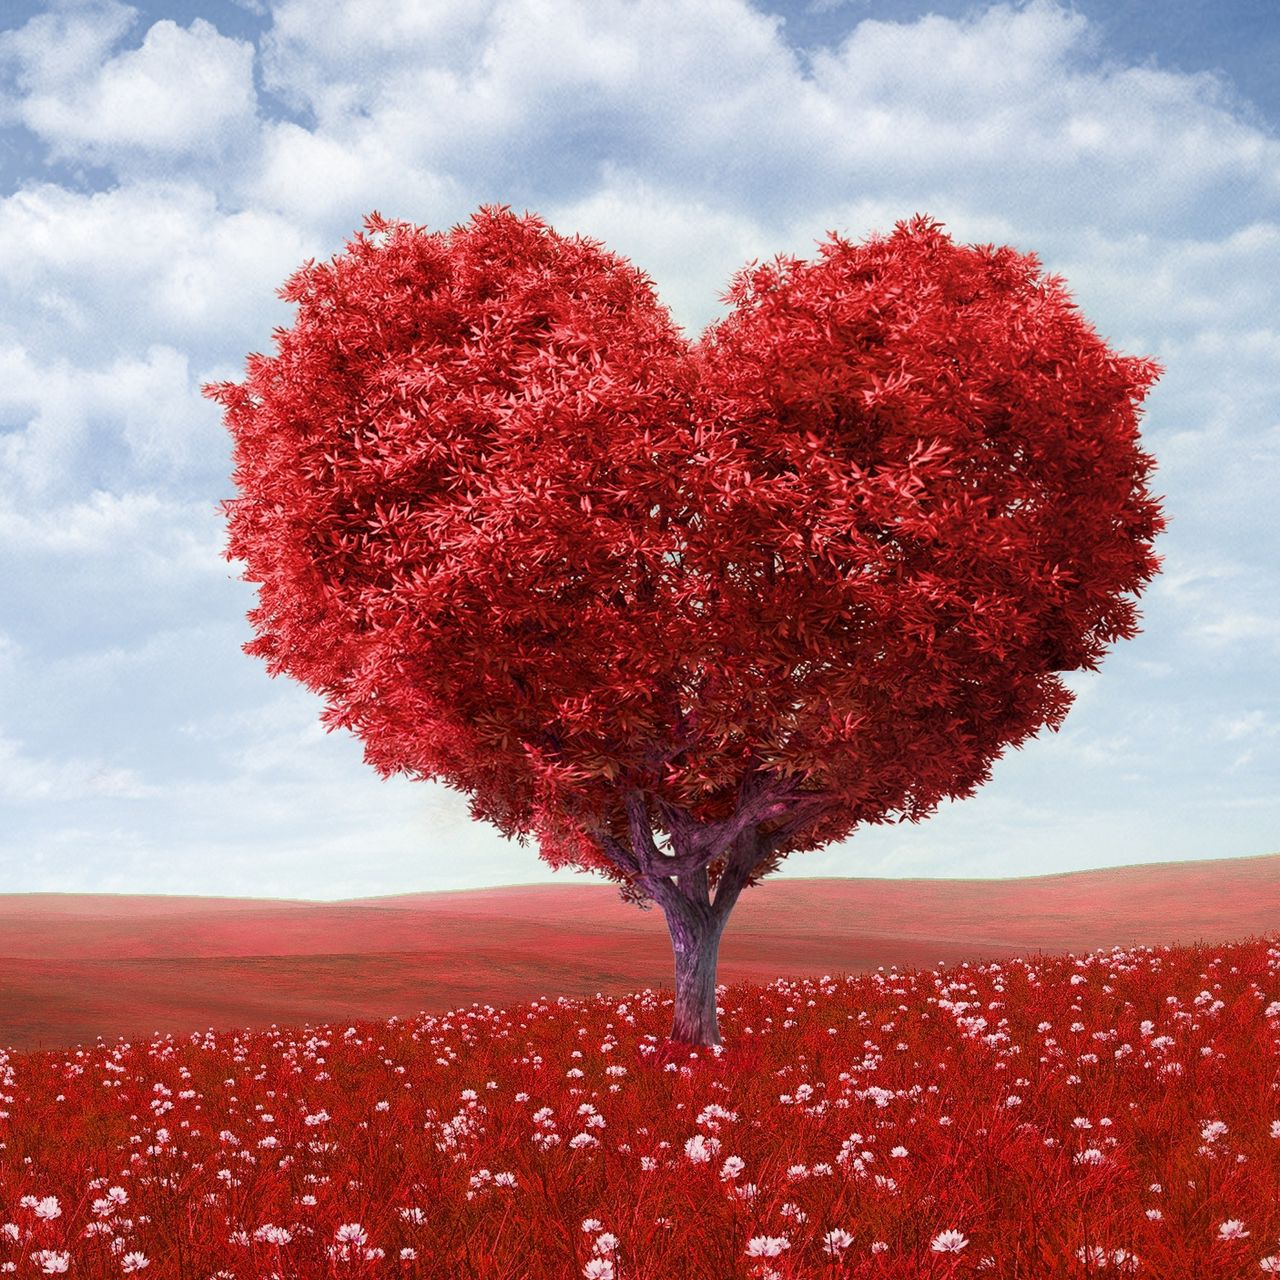 1280x1280 Wallpaper tree, heart, photoshop, field, grass, romance